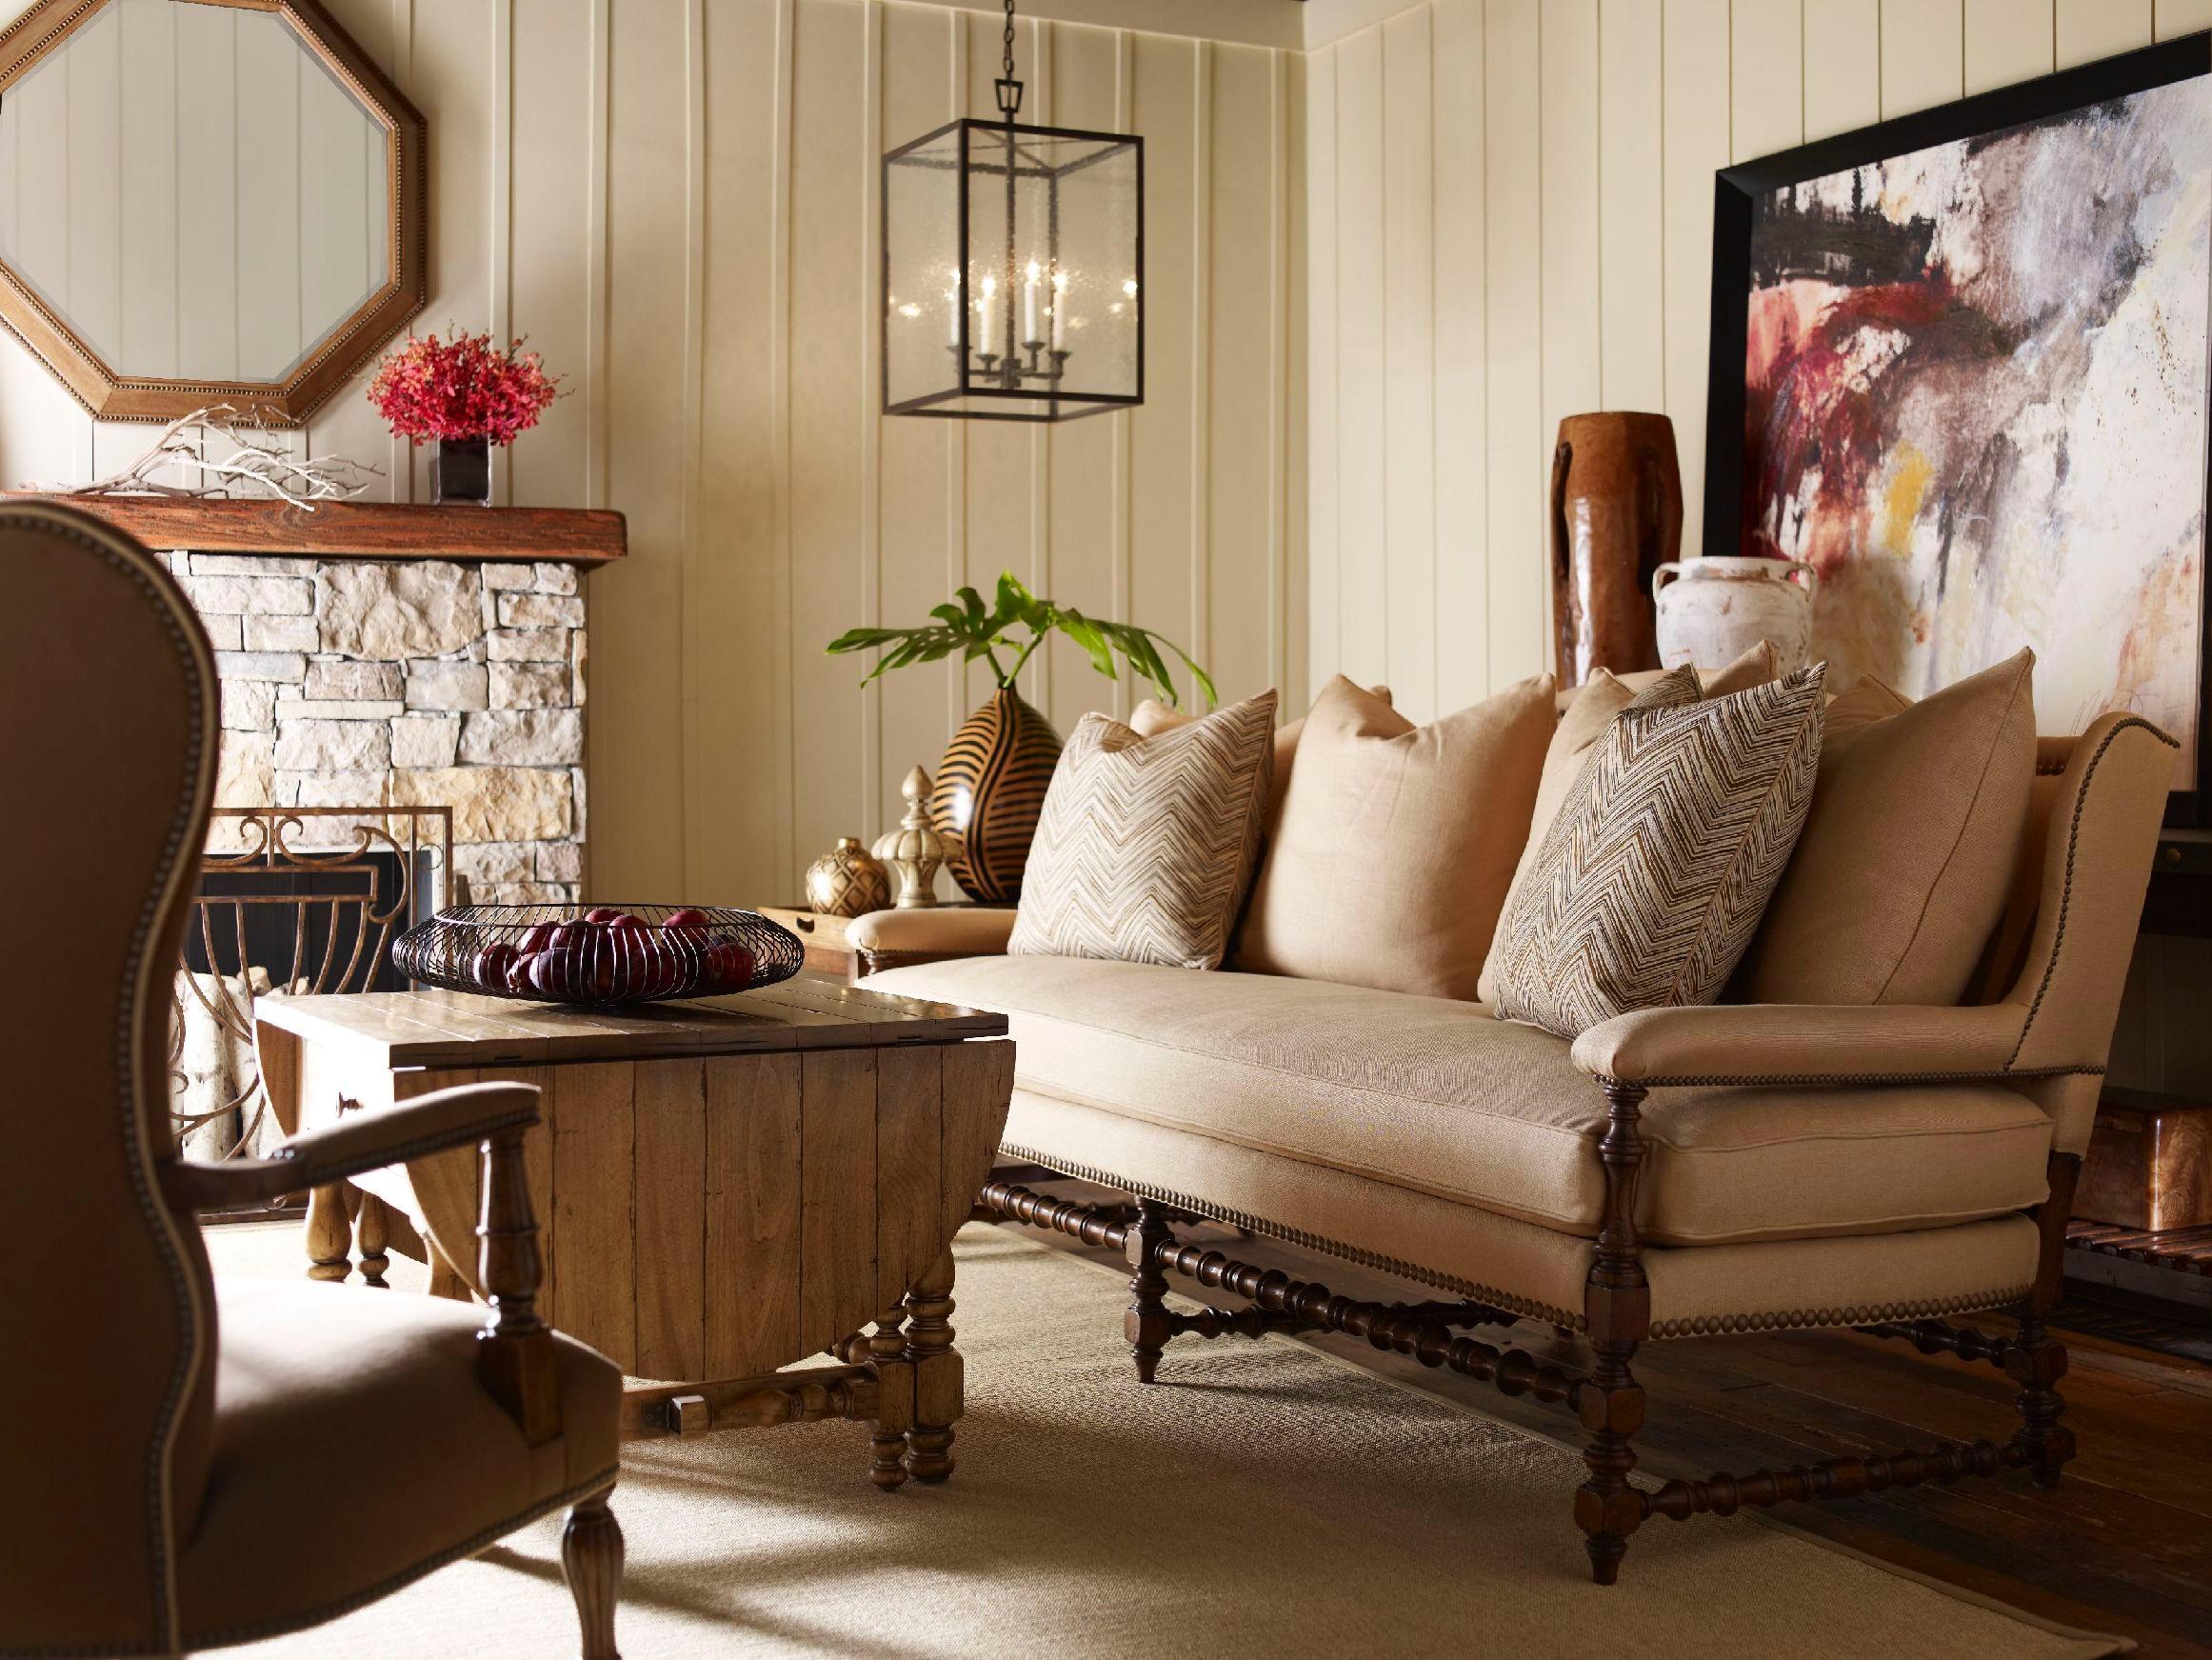 Chaddock Living Room Cottage Sofa UC3505 Chaddock Morganton NC